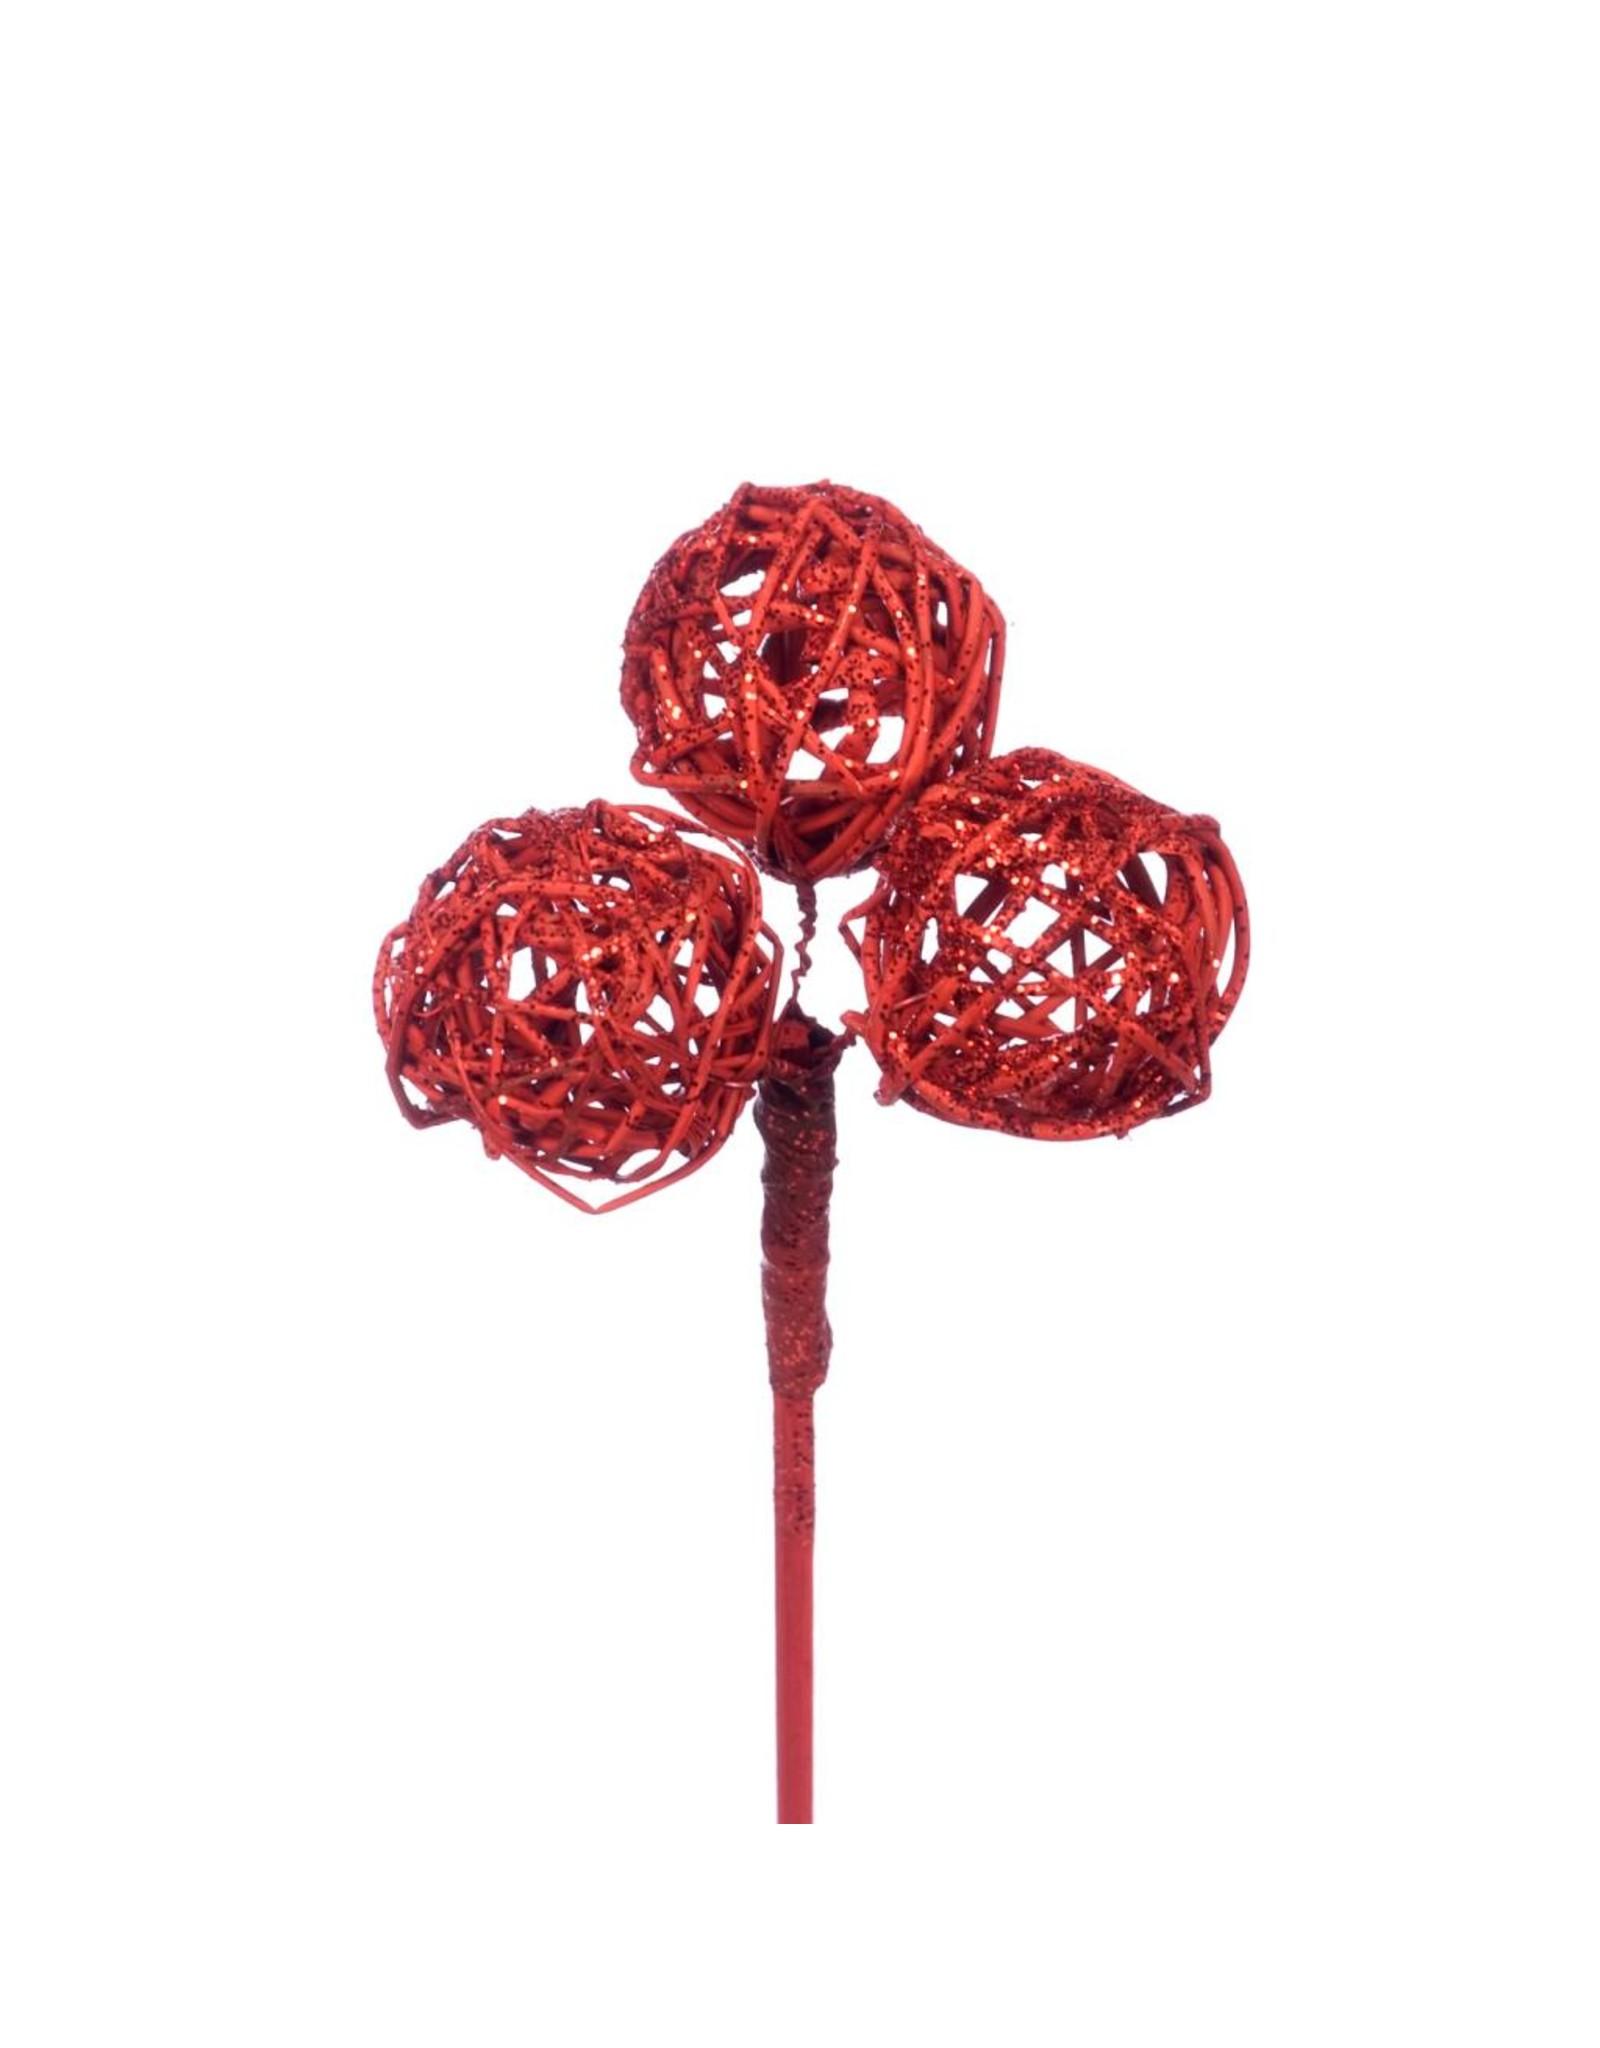 Brunch ball mini 3pc on stem 10pc red red glitter x 18